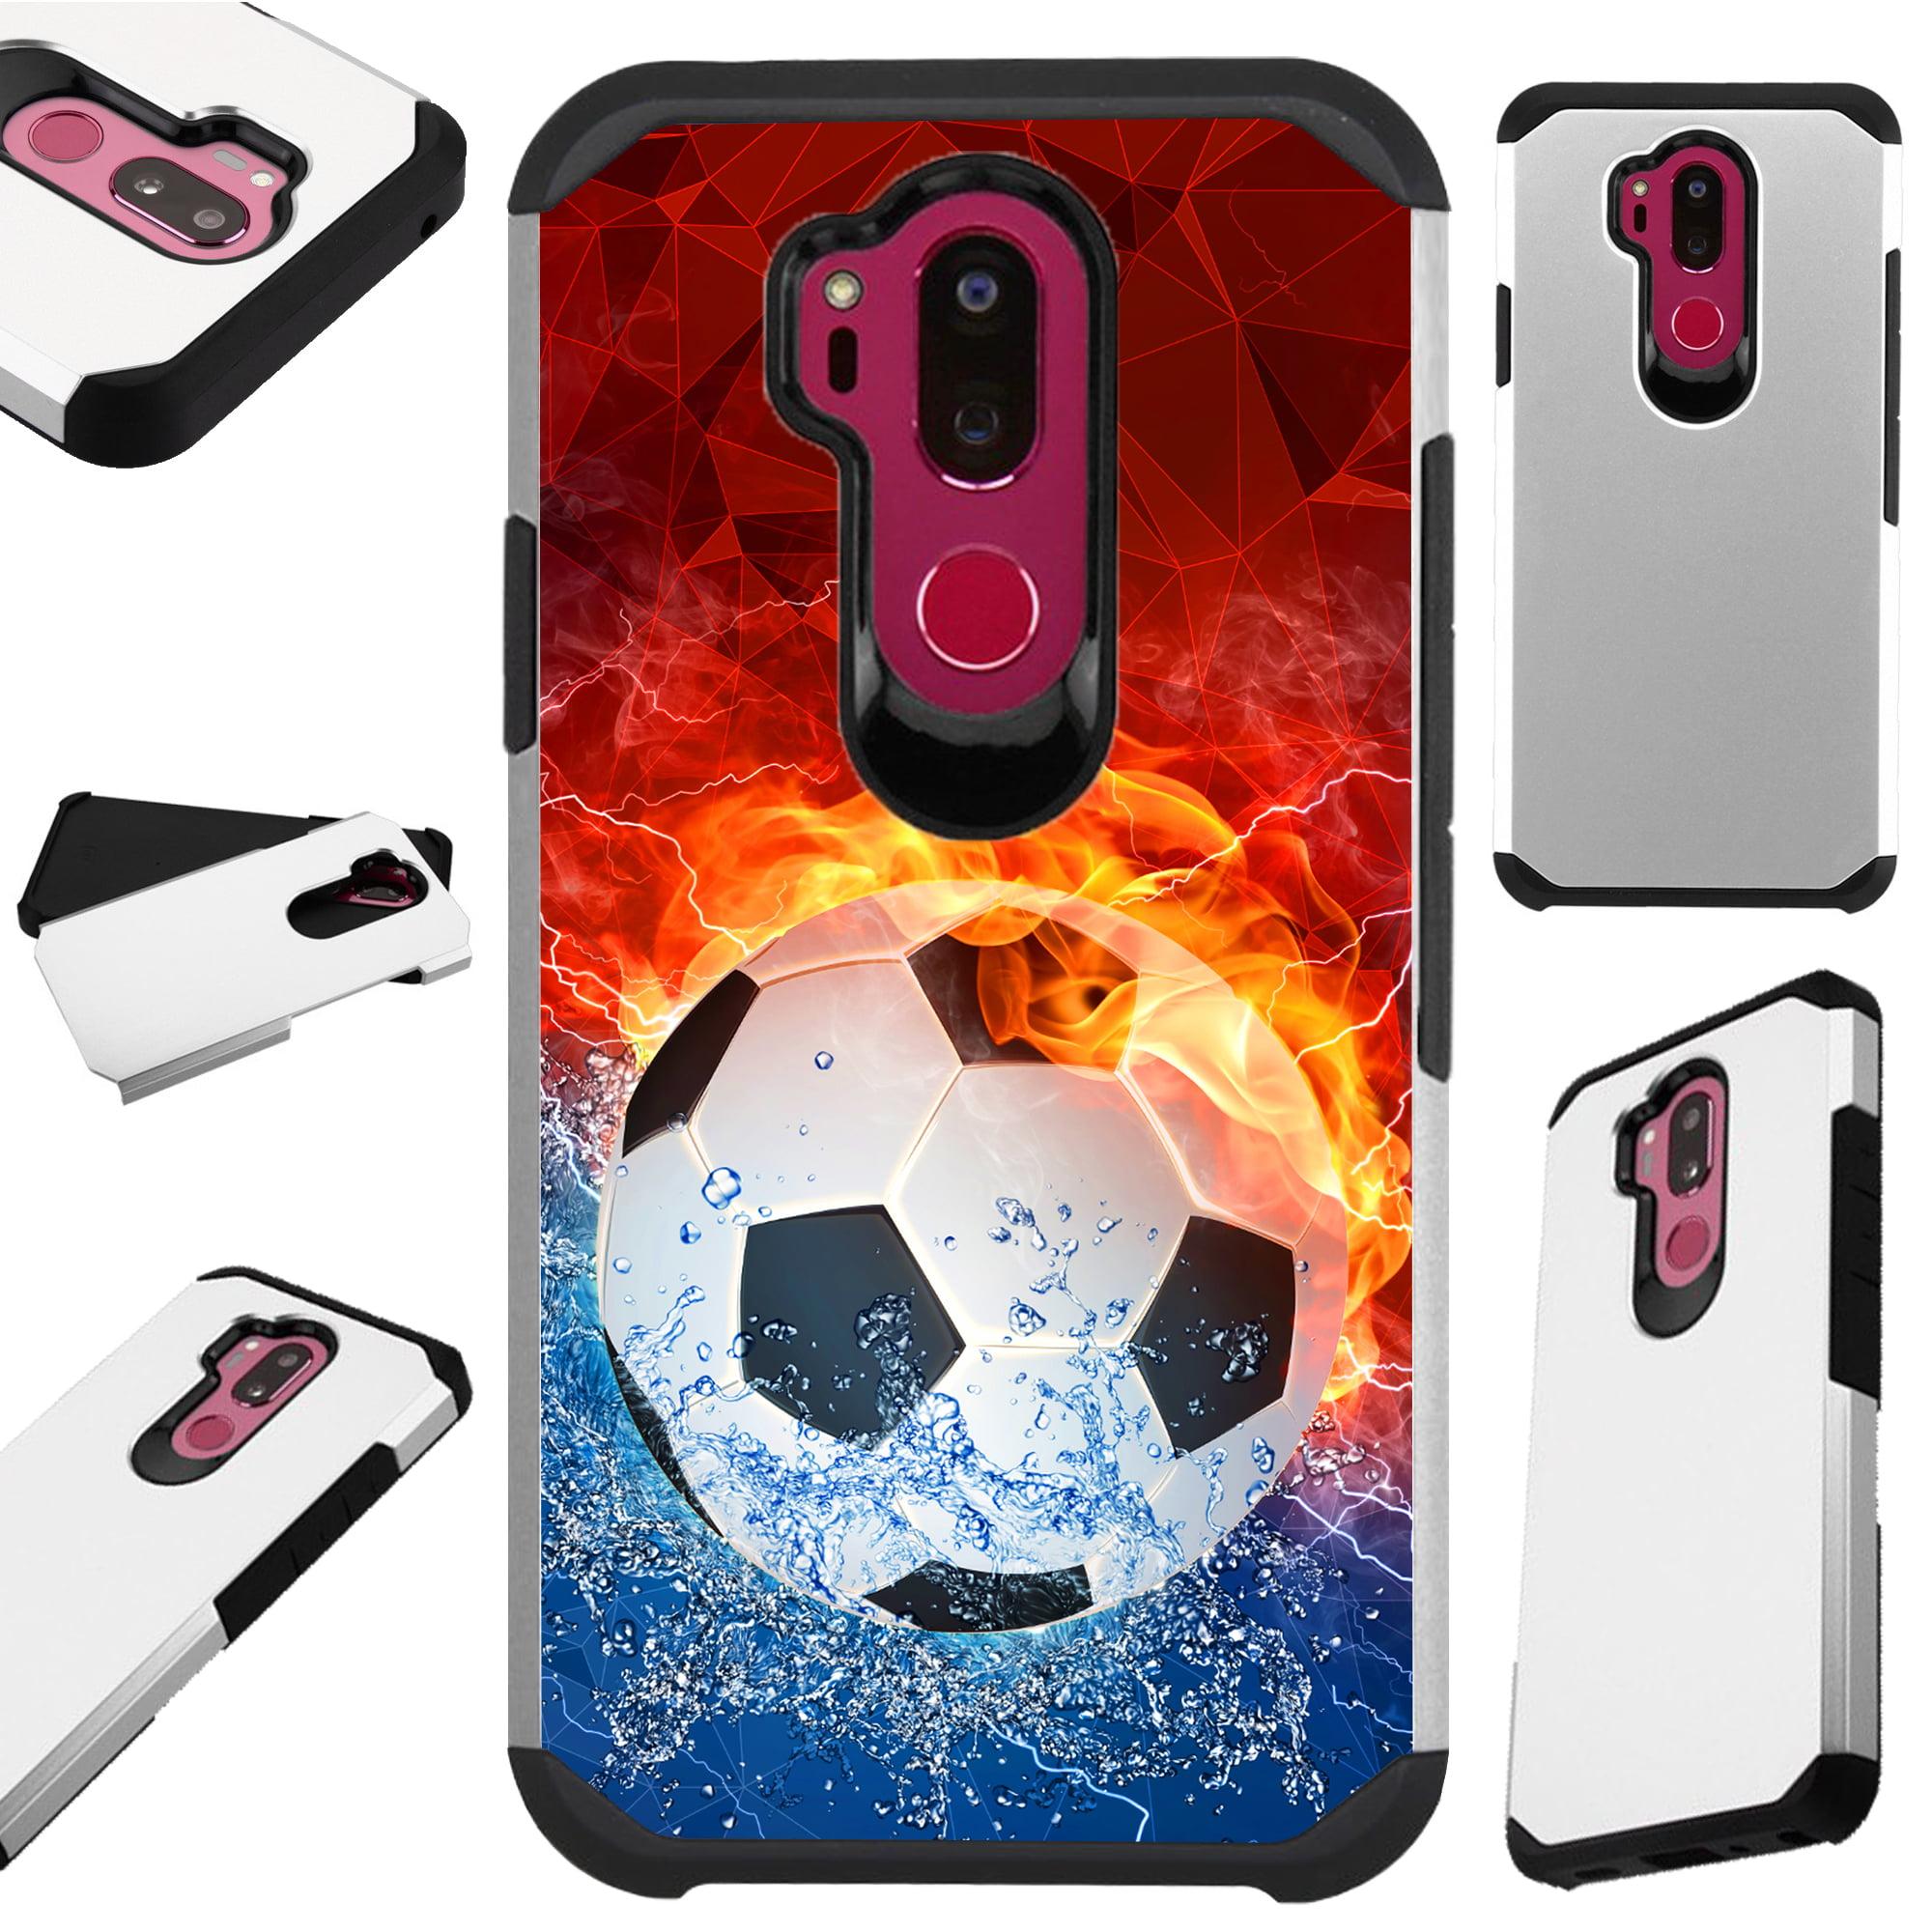 For LG G7 ThinQ | LG G7 Case Hybrid TPU Fusion Phone Cover (Soccer Storm)